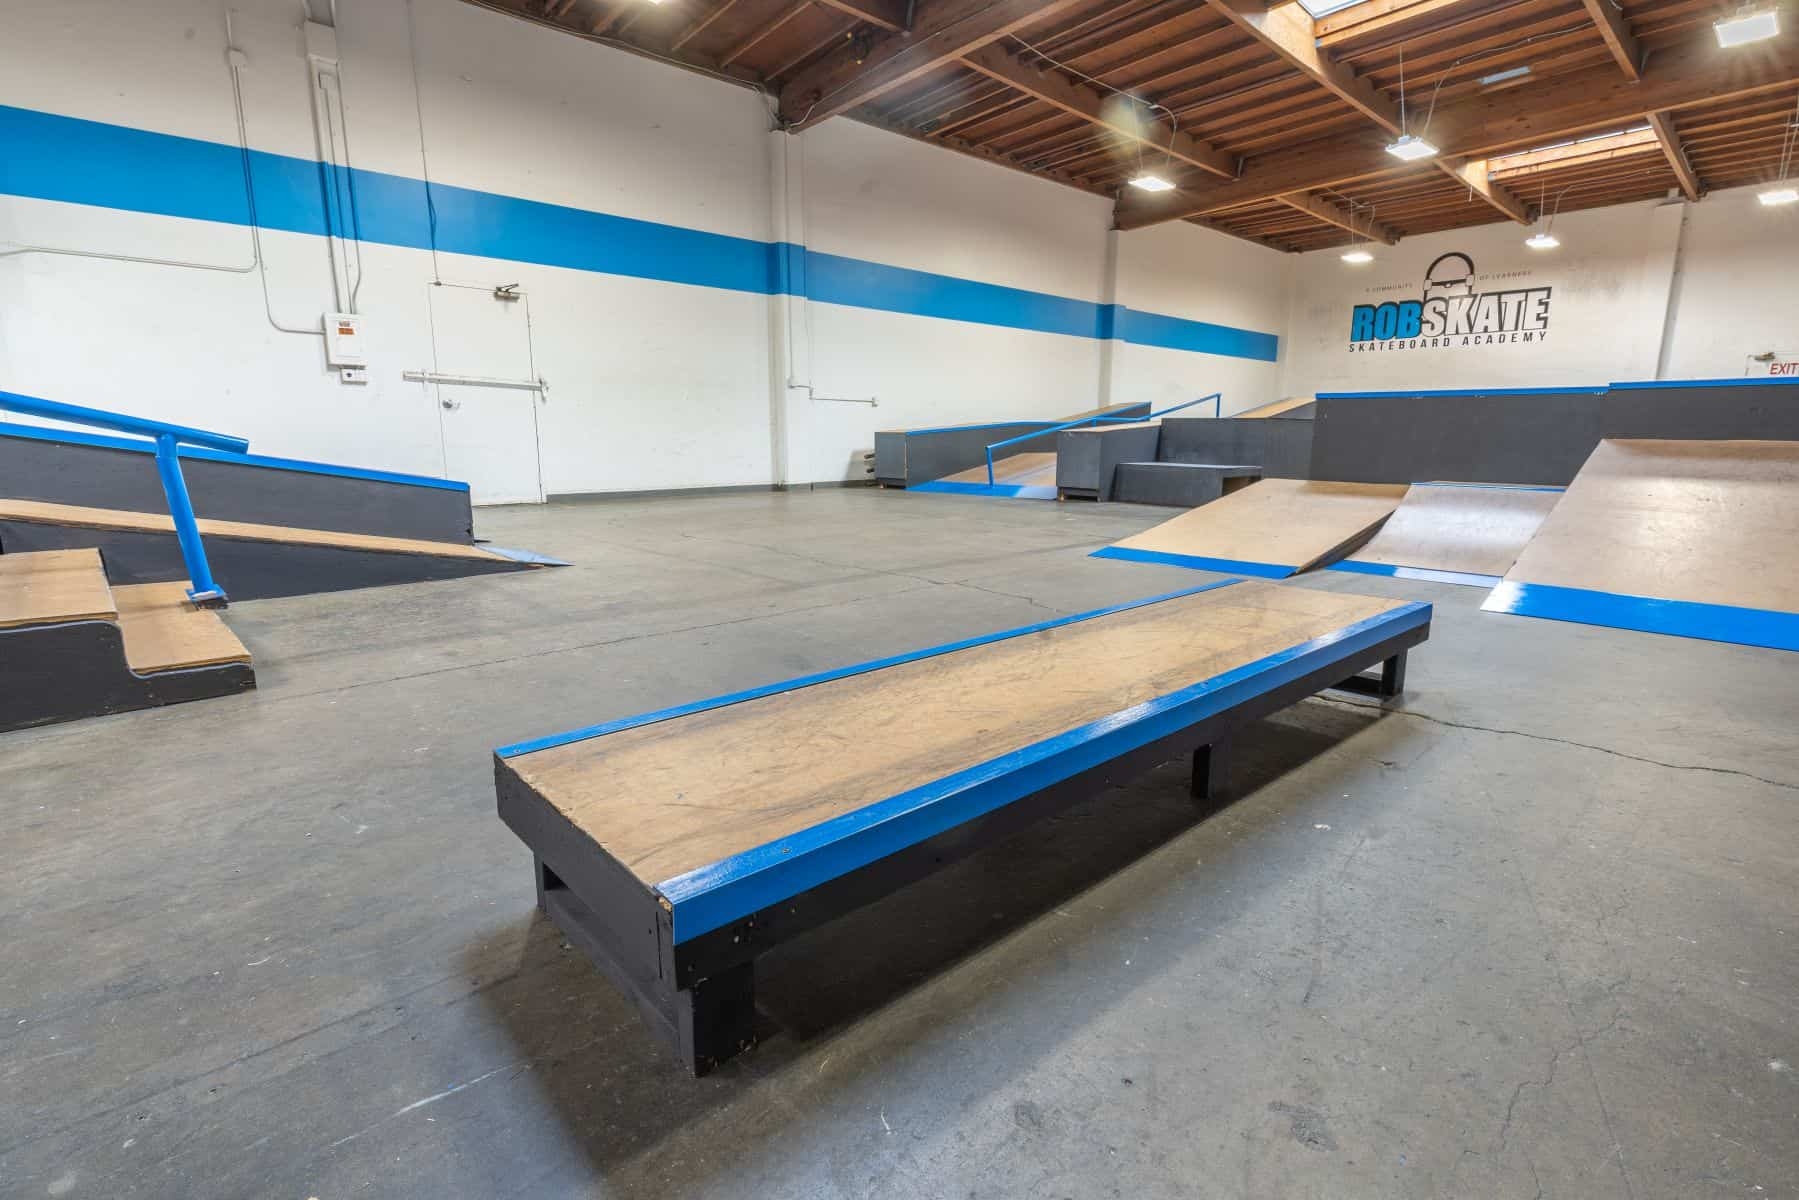 Rob Skate - San Leandro Private Skatepark 13